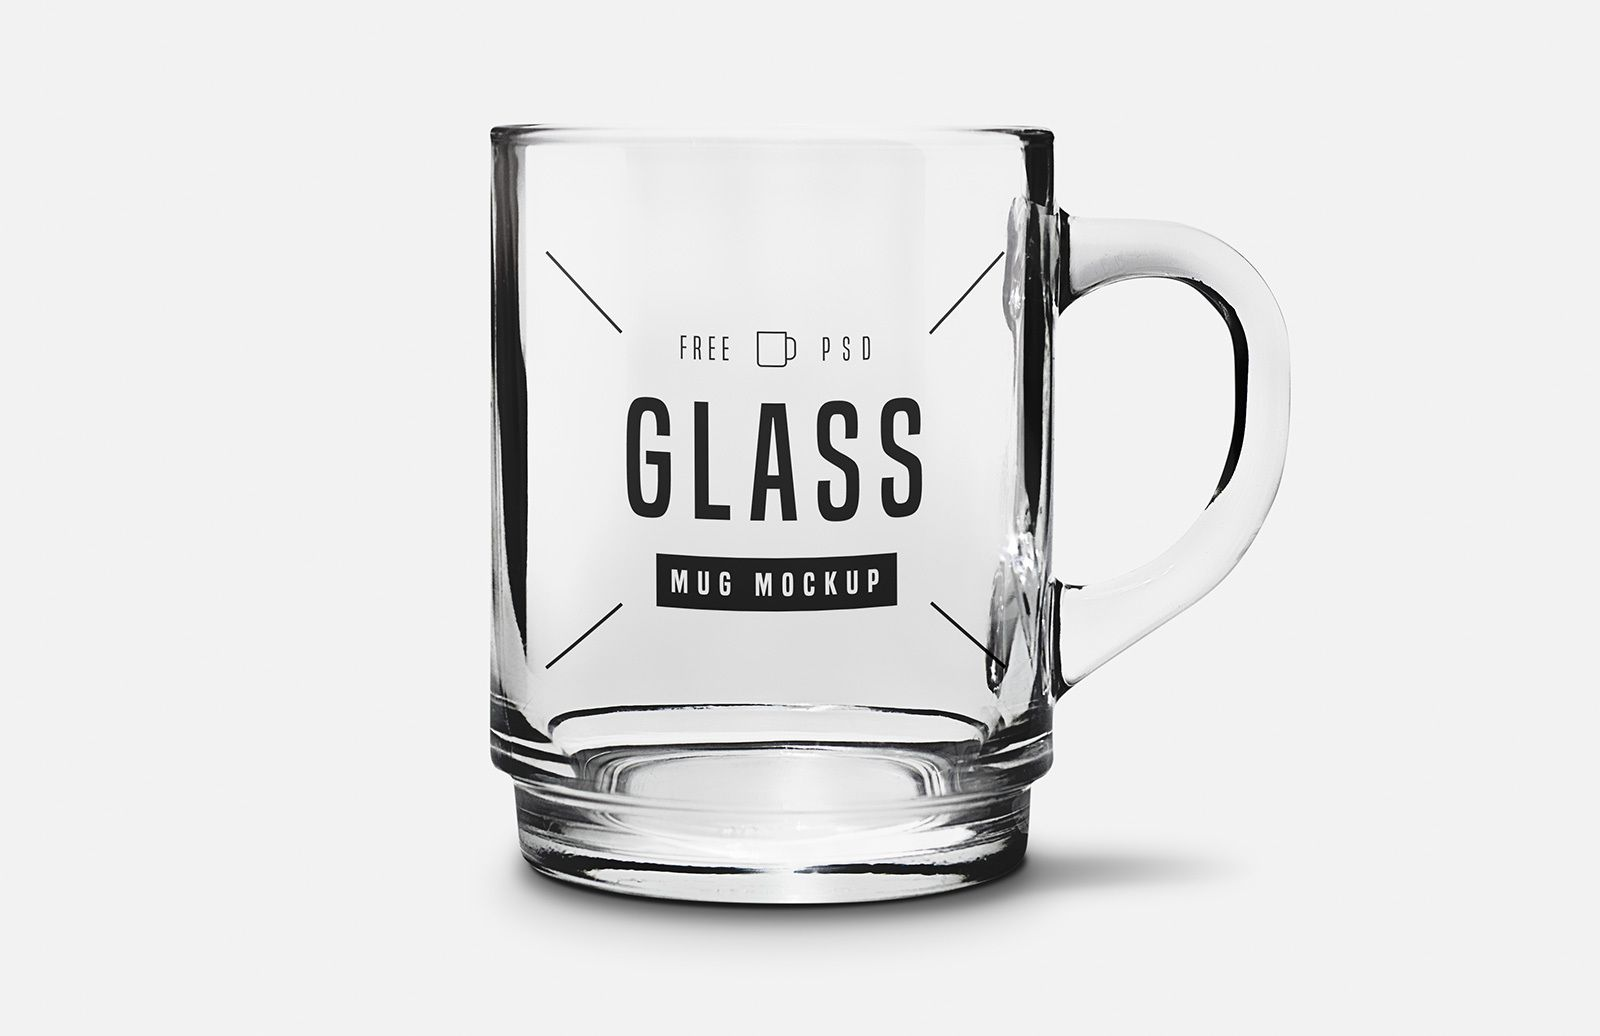 Free Glass Mug Mockup Mugs Poster Design Glass